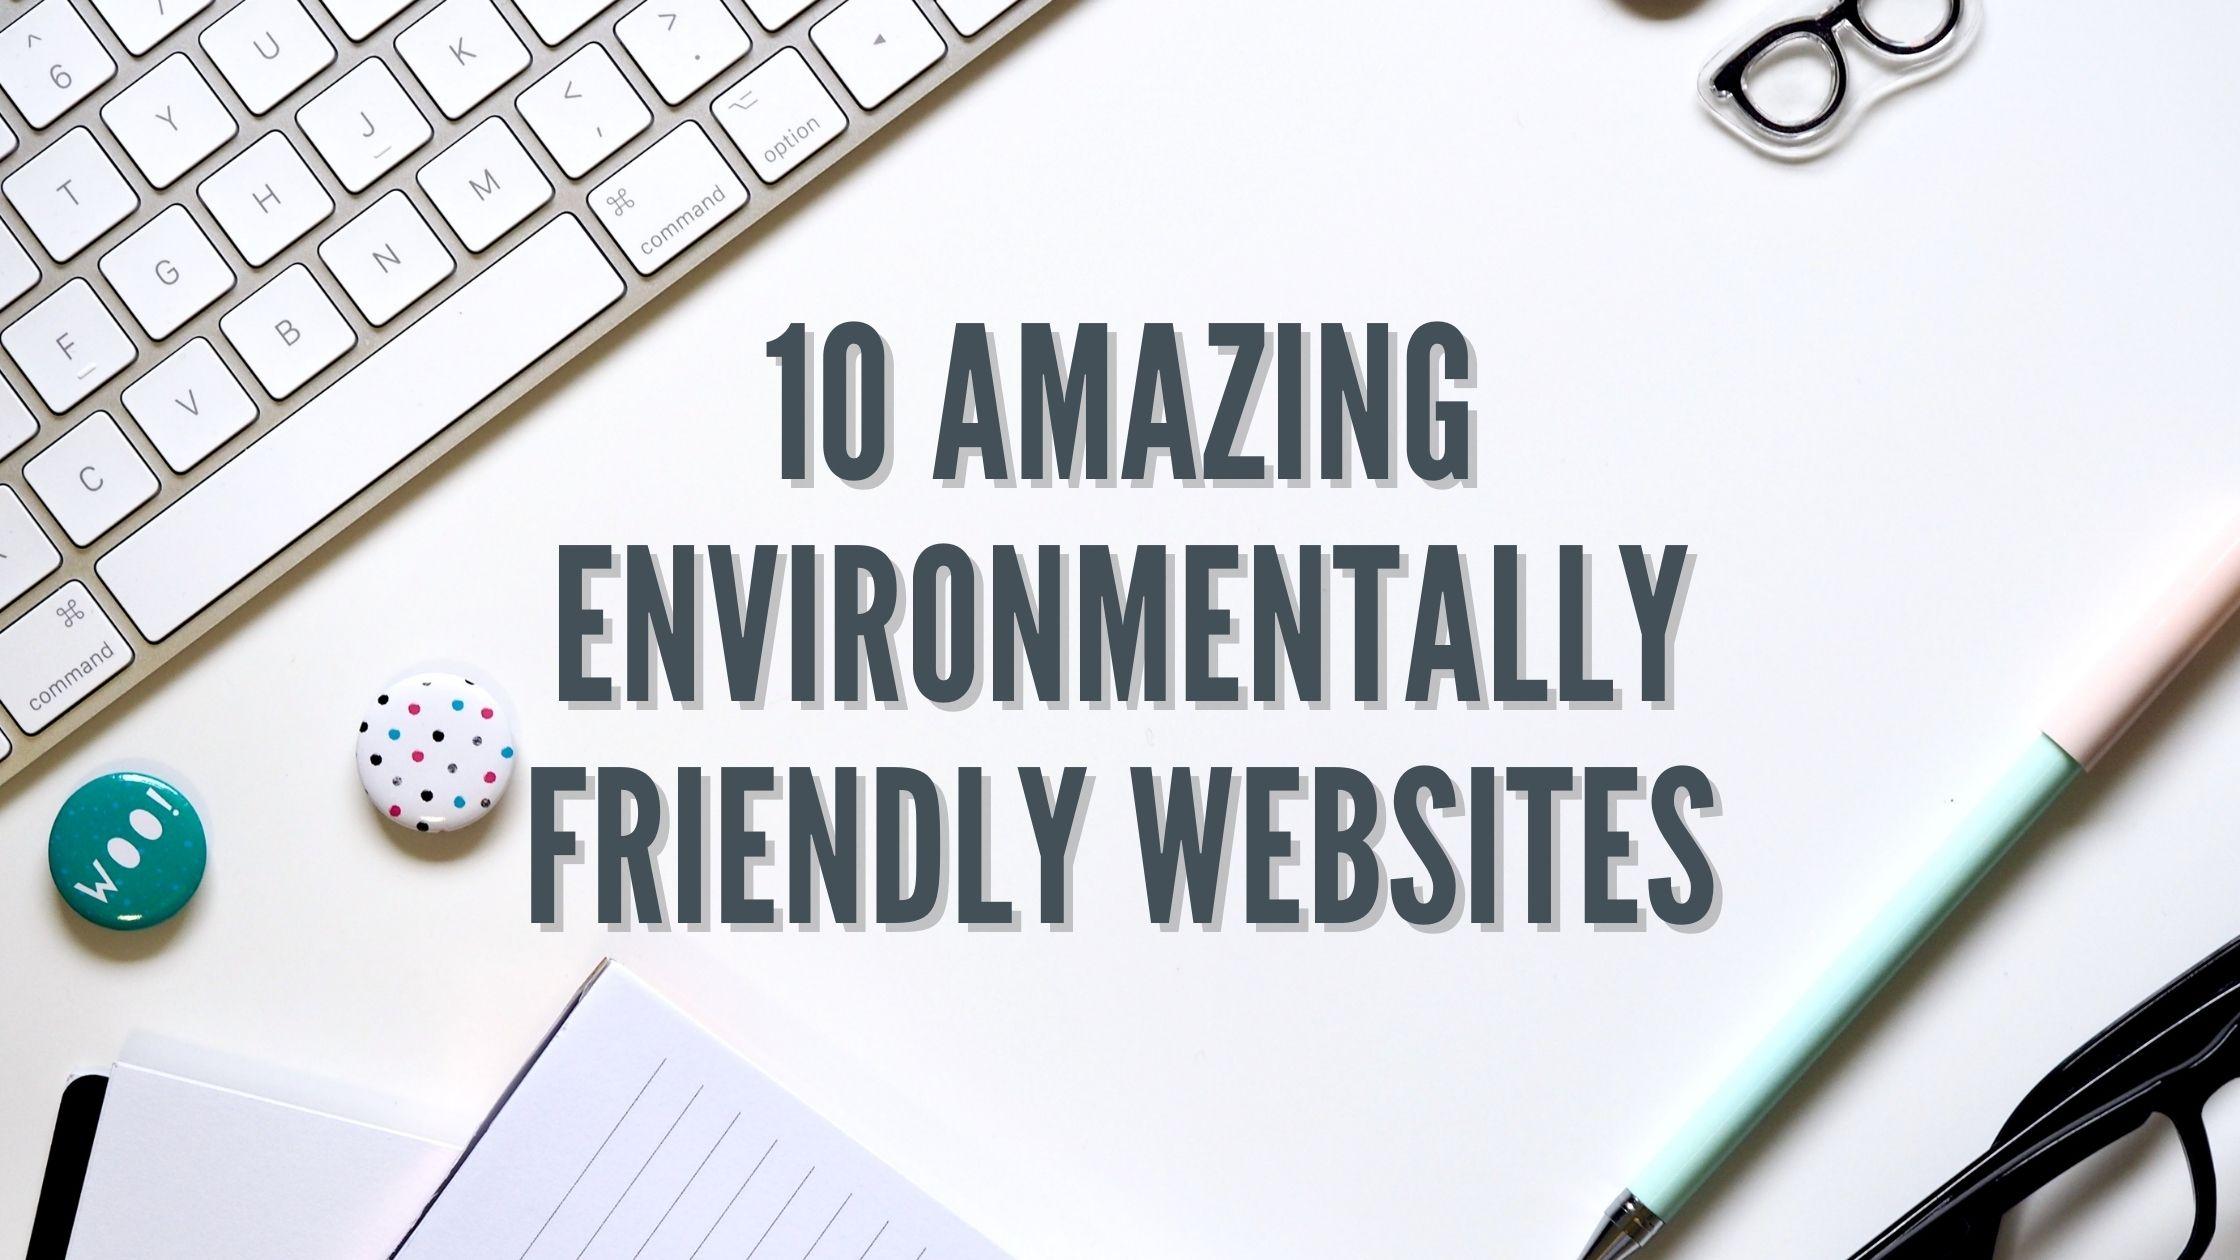 10 Amazing Environmentally Friendly Websites